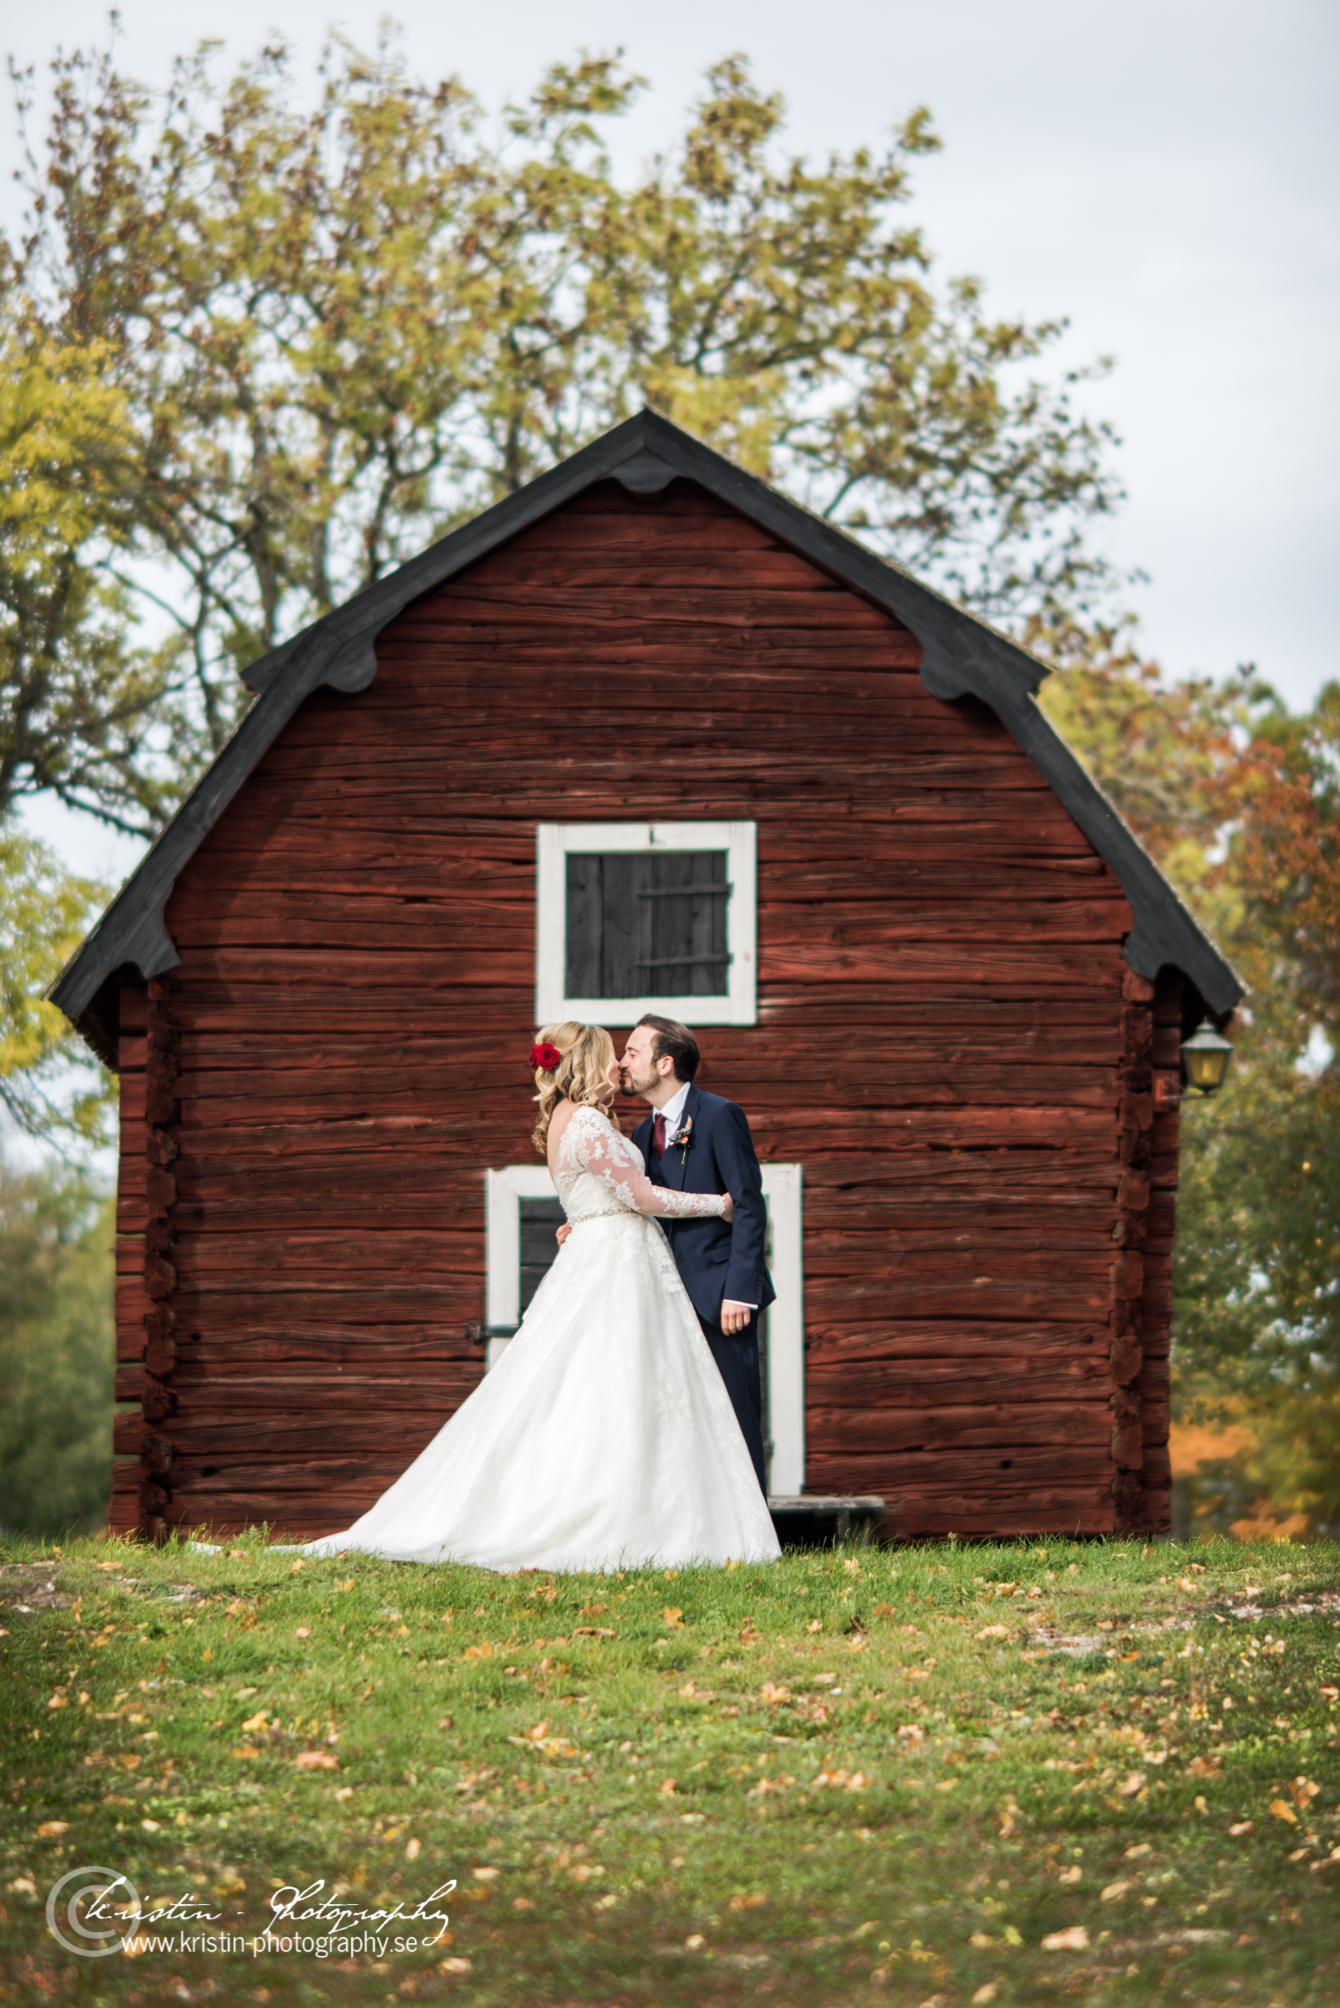 Fotograf i Eskilstuna, Kristin - Photography-103.jpg